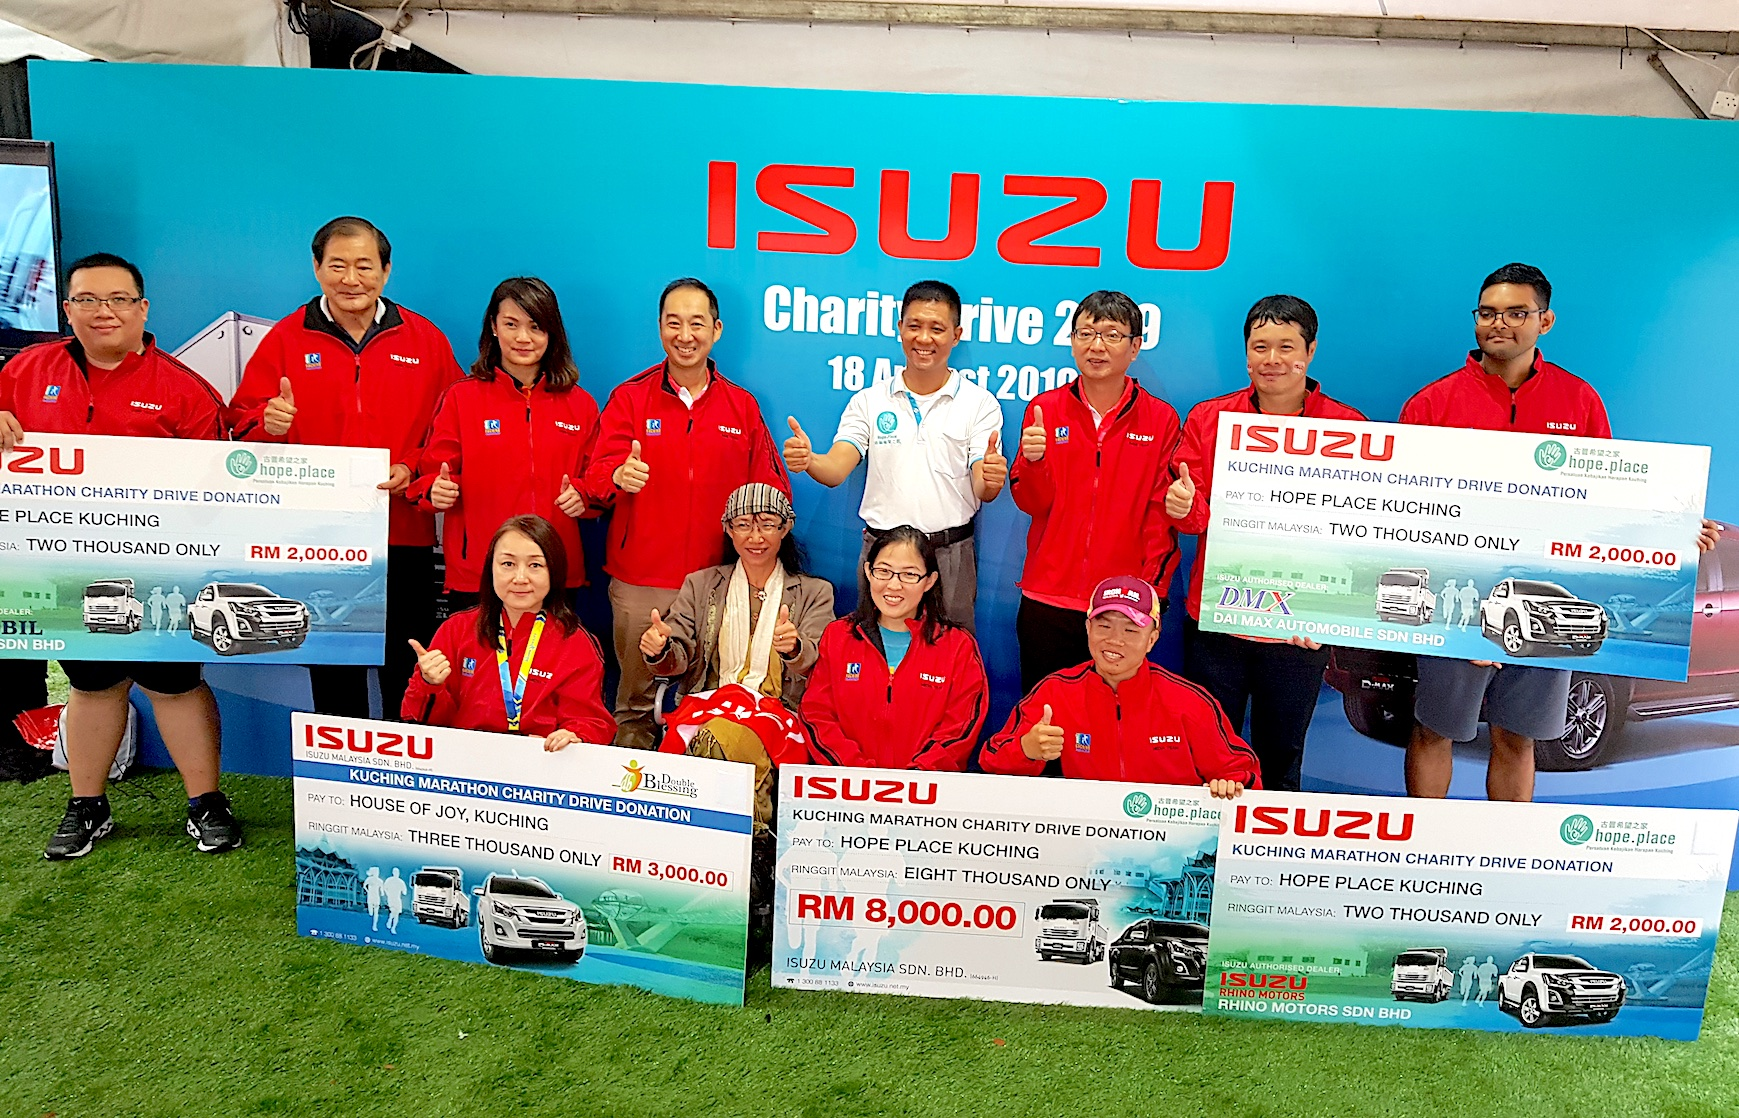 Isuzu Charity Presentation